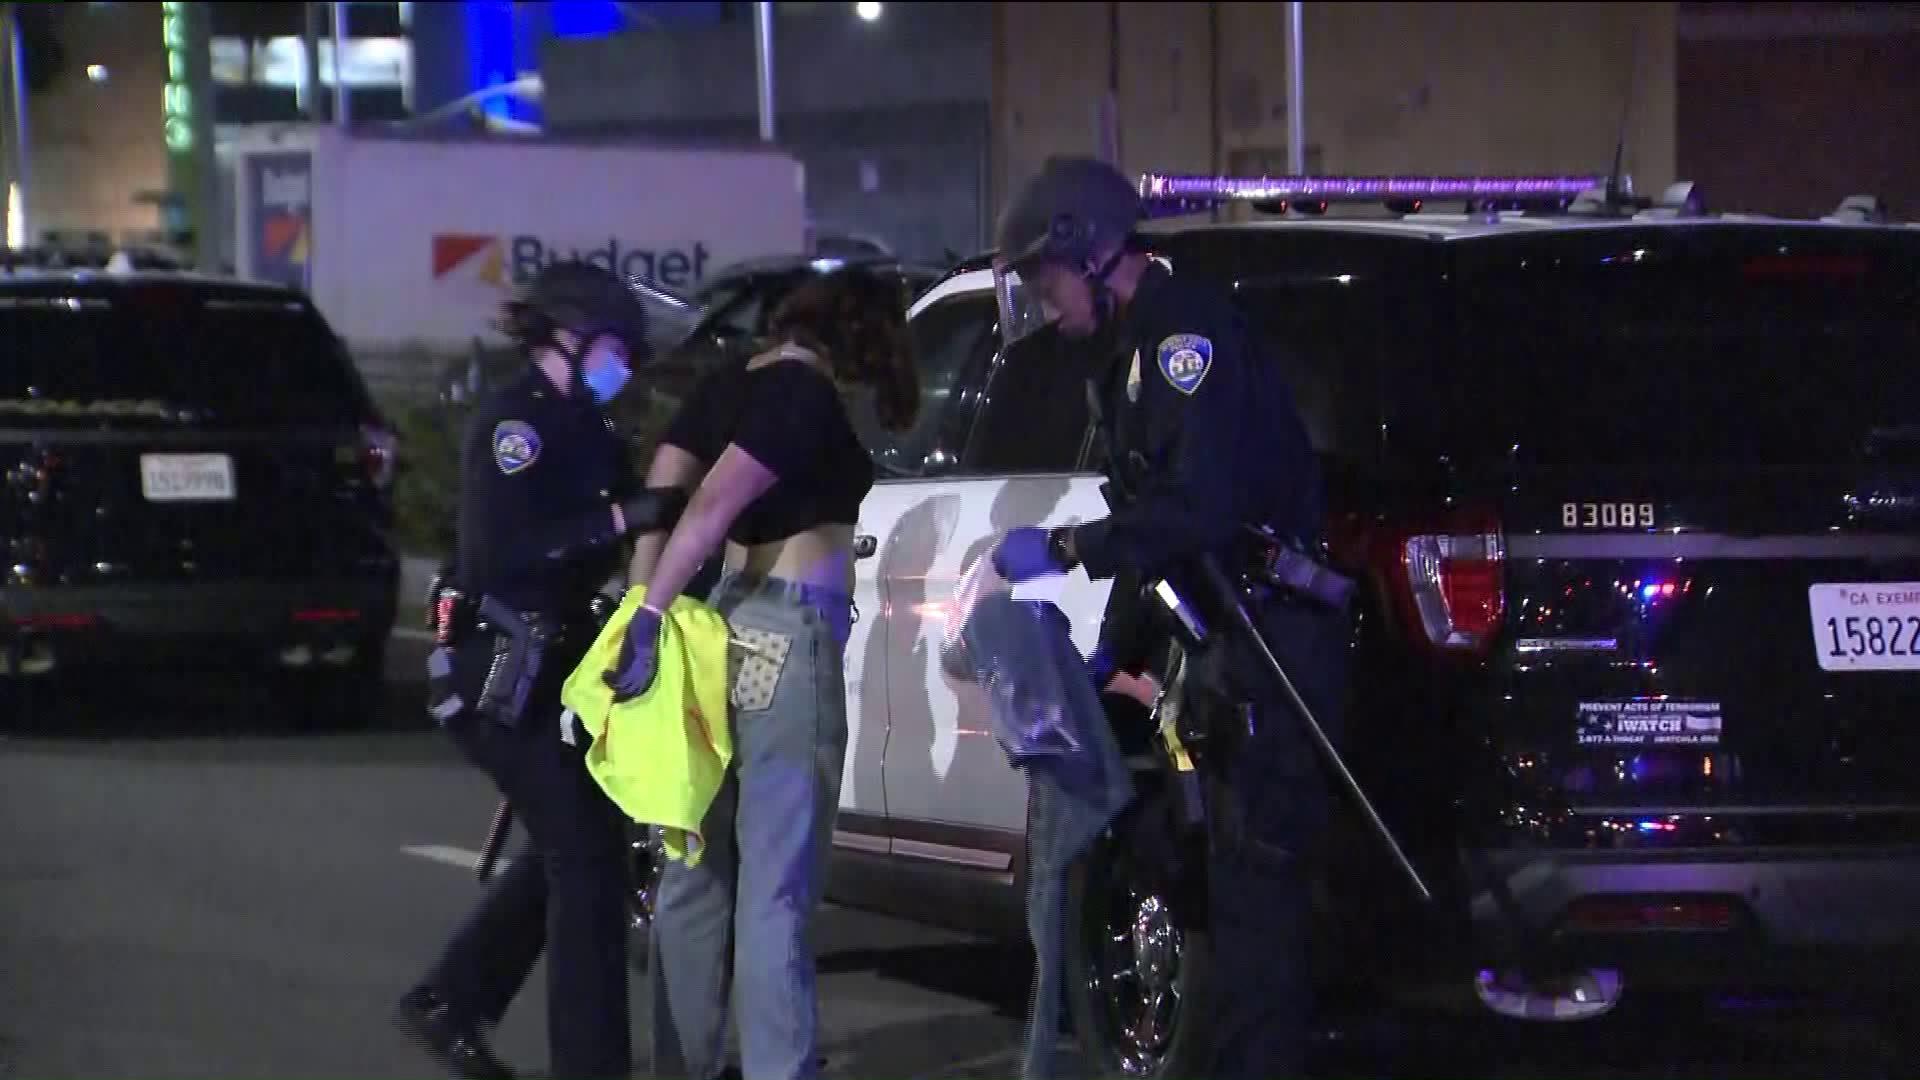 A protester is arrested on July 23, 2020, in Beverly Hills. (KTLA)